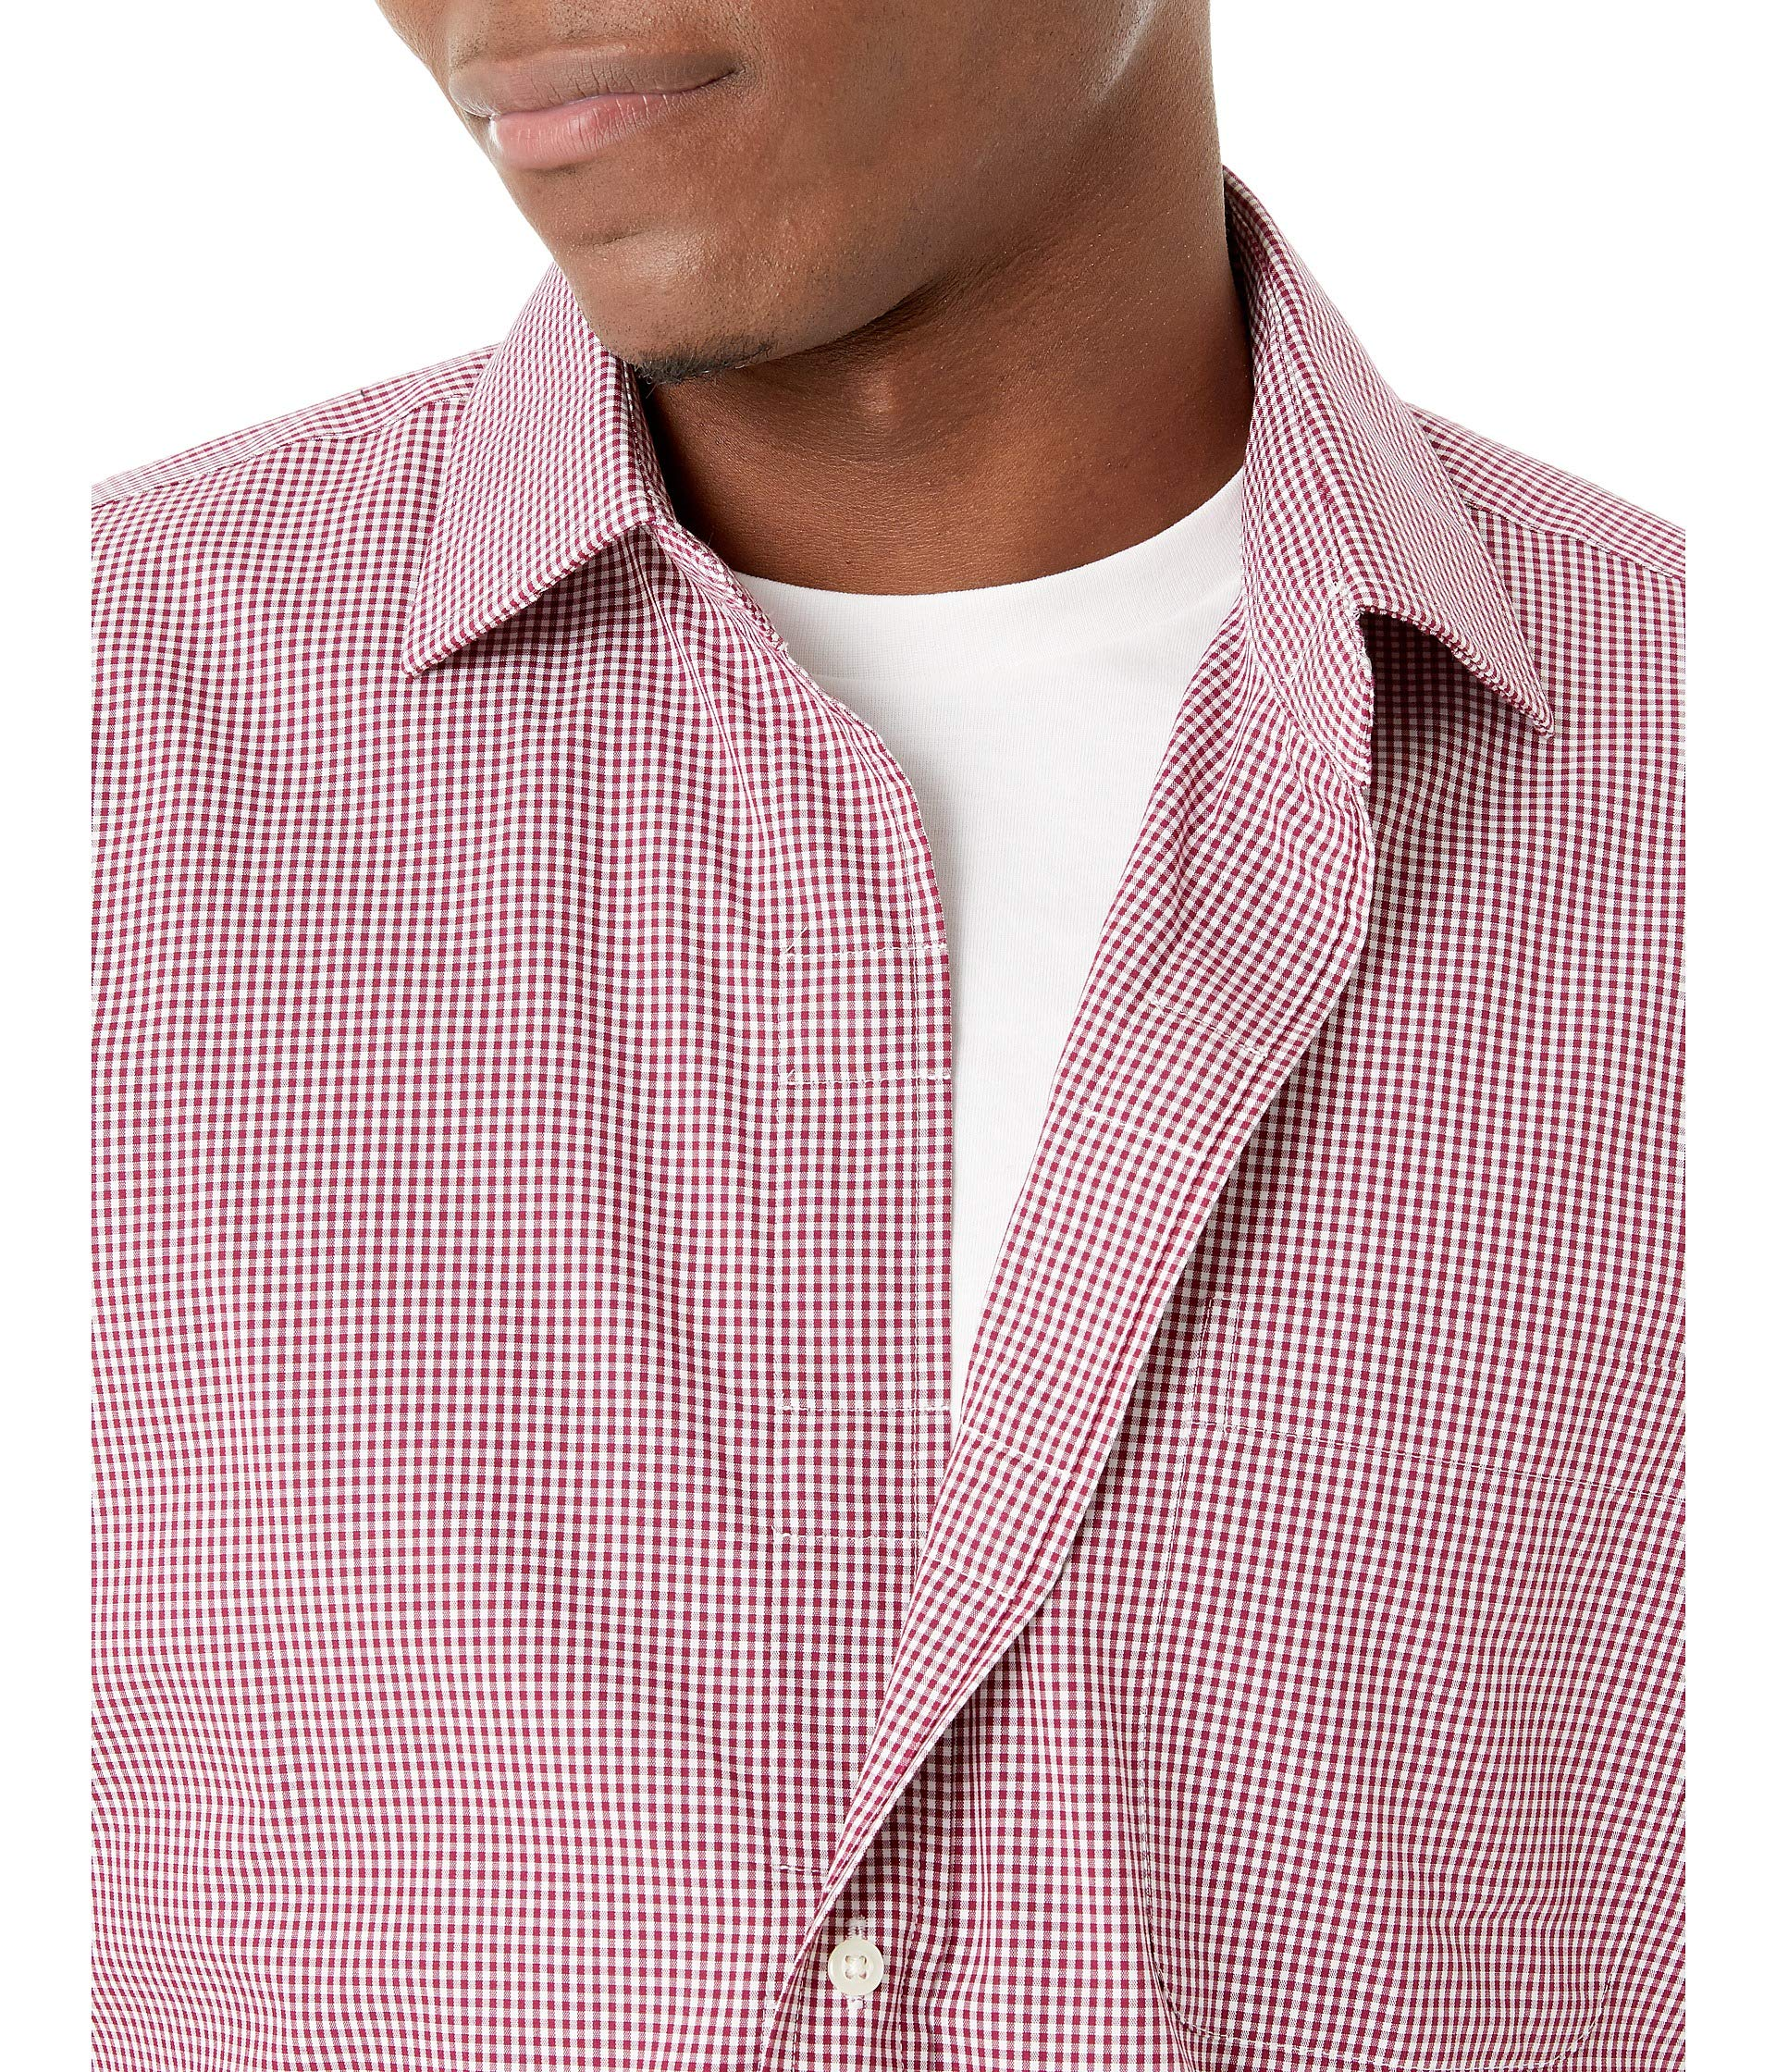 Shirt Long Ready Spread Dress Small Sleeve Wine Magna Check Collar YqwvY